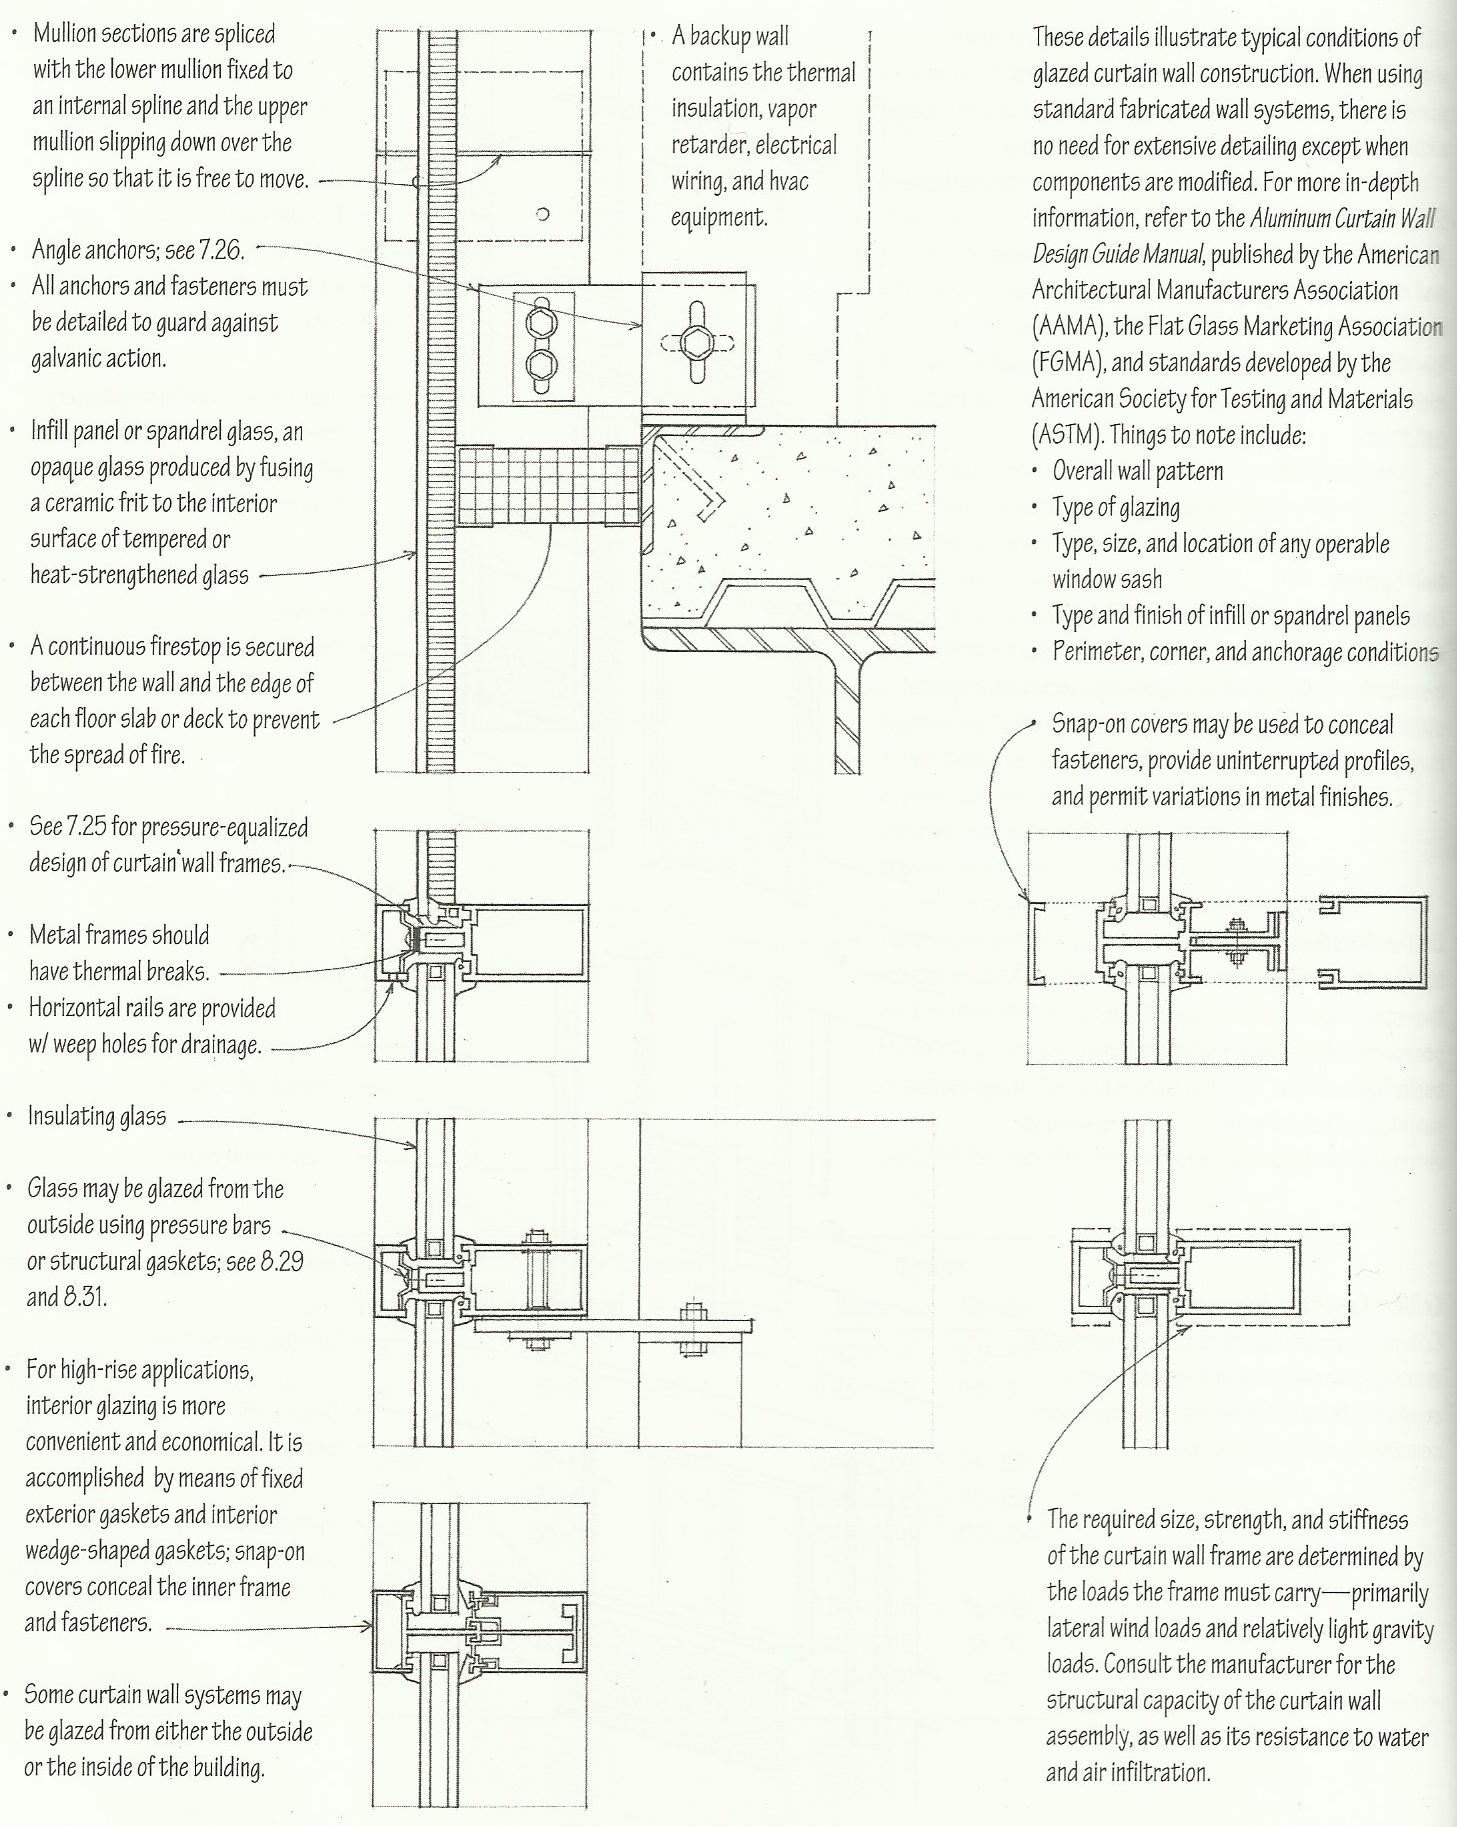 ARCH29969 - MODULE 14